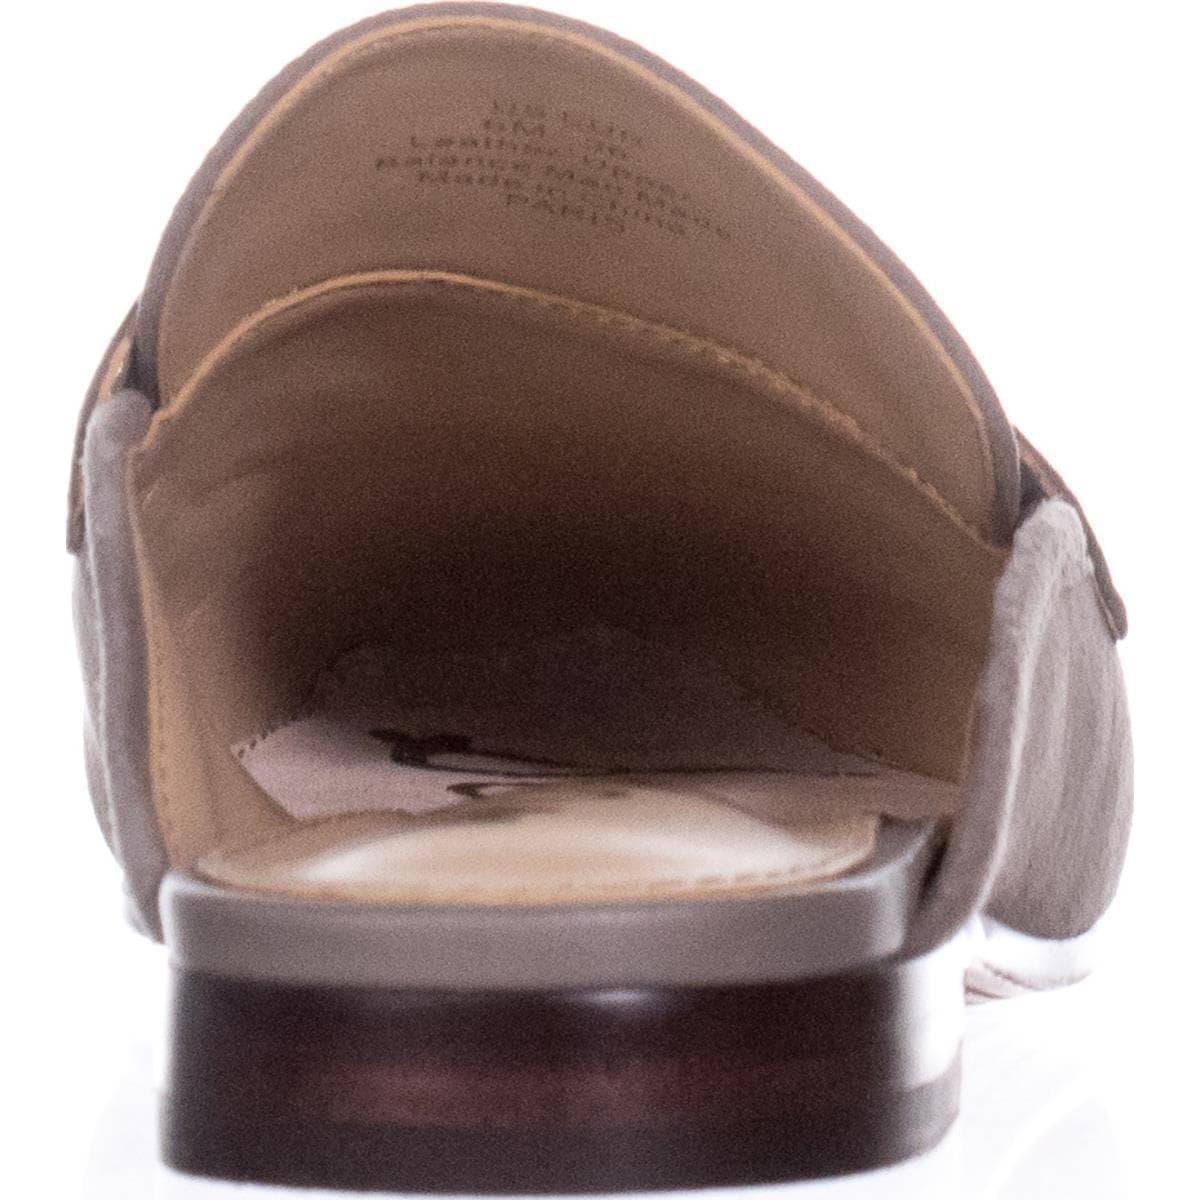 e629c9437 Shop Sam Edelman Paris Backless Tassel Loafers